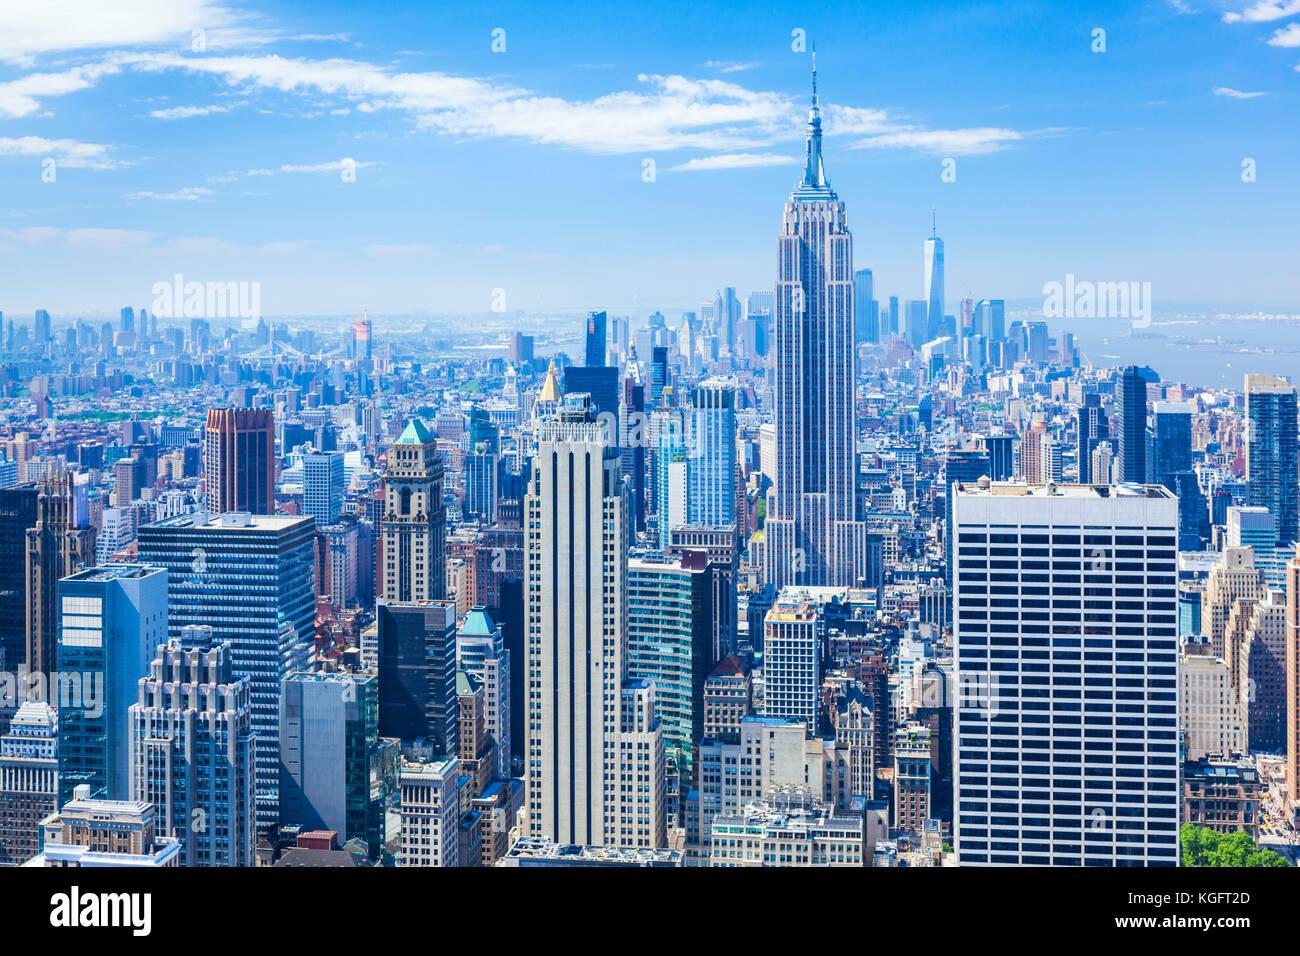 Manhattan skyline, New York Skyline, Empire State Building, New York City, United States of America, North America, - Stock Image